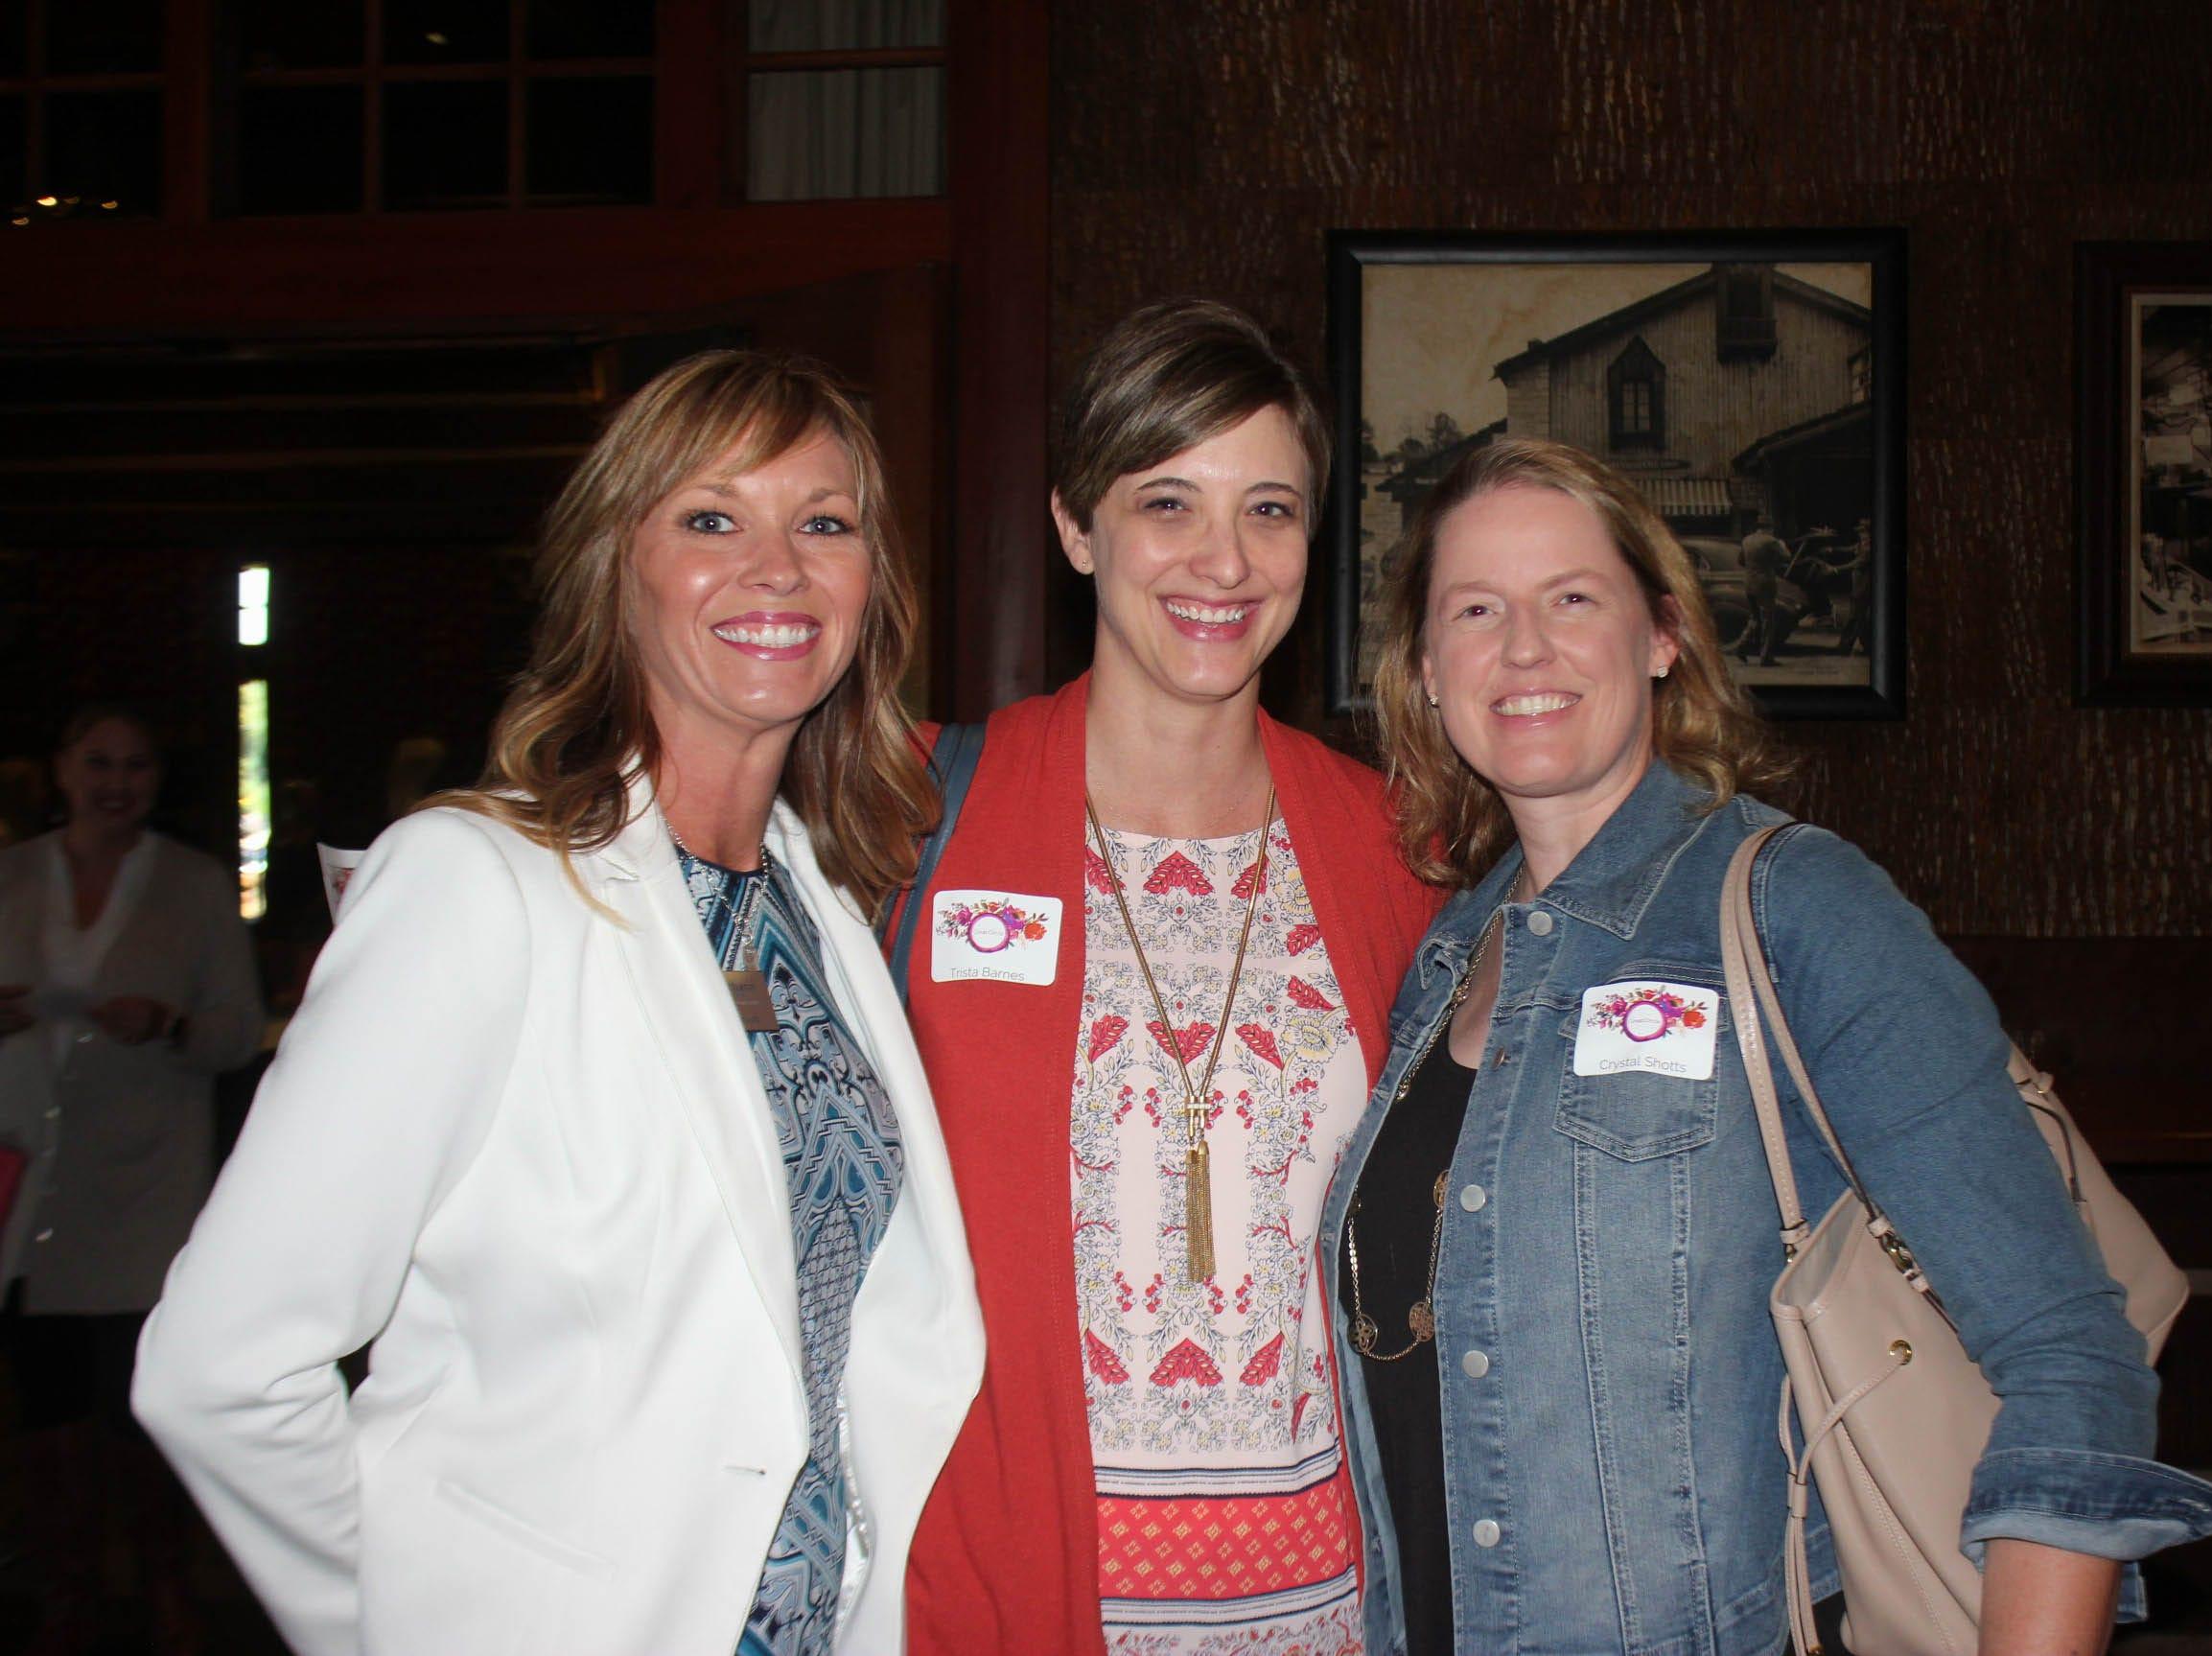 Sarah Watson, Trista Barnes, and Crystal Shotts